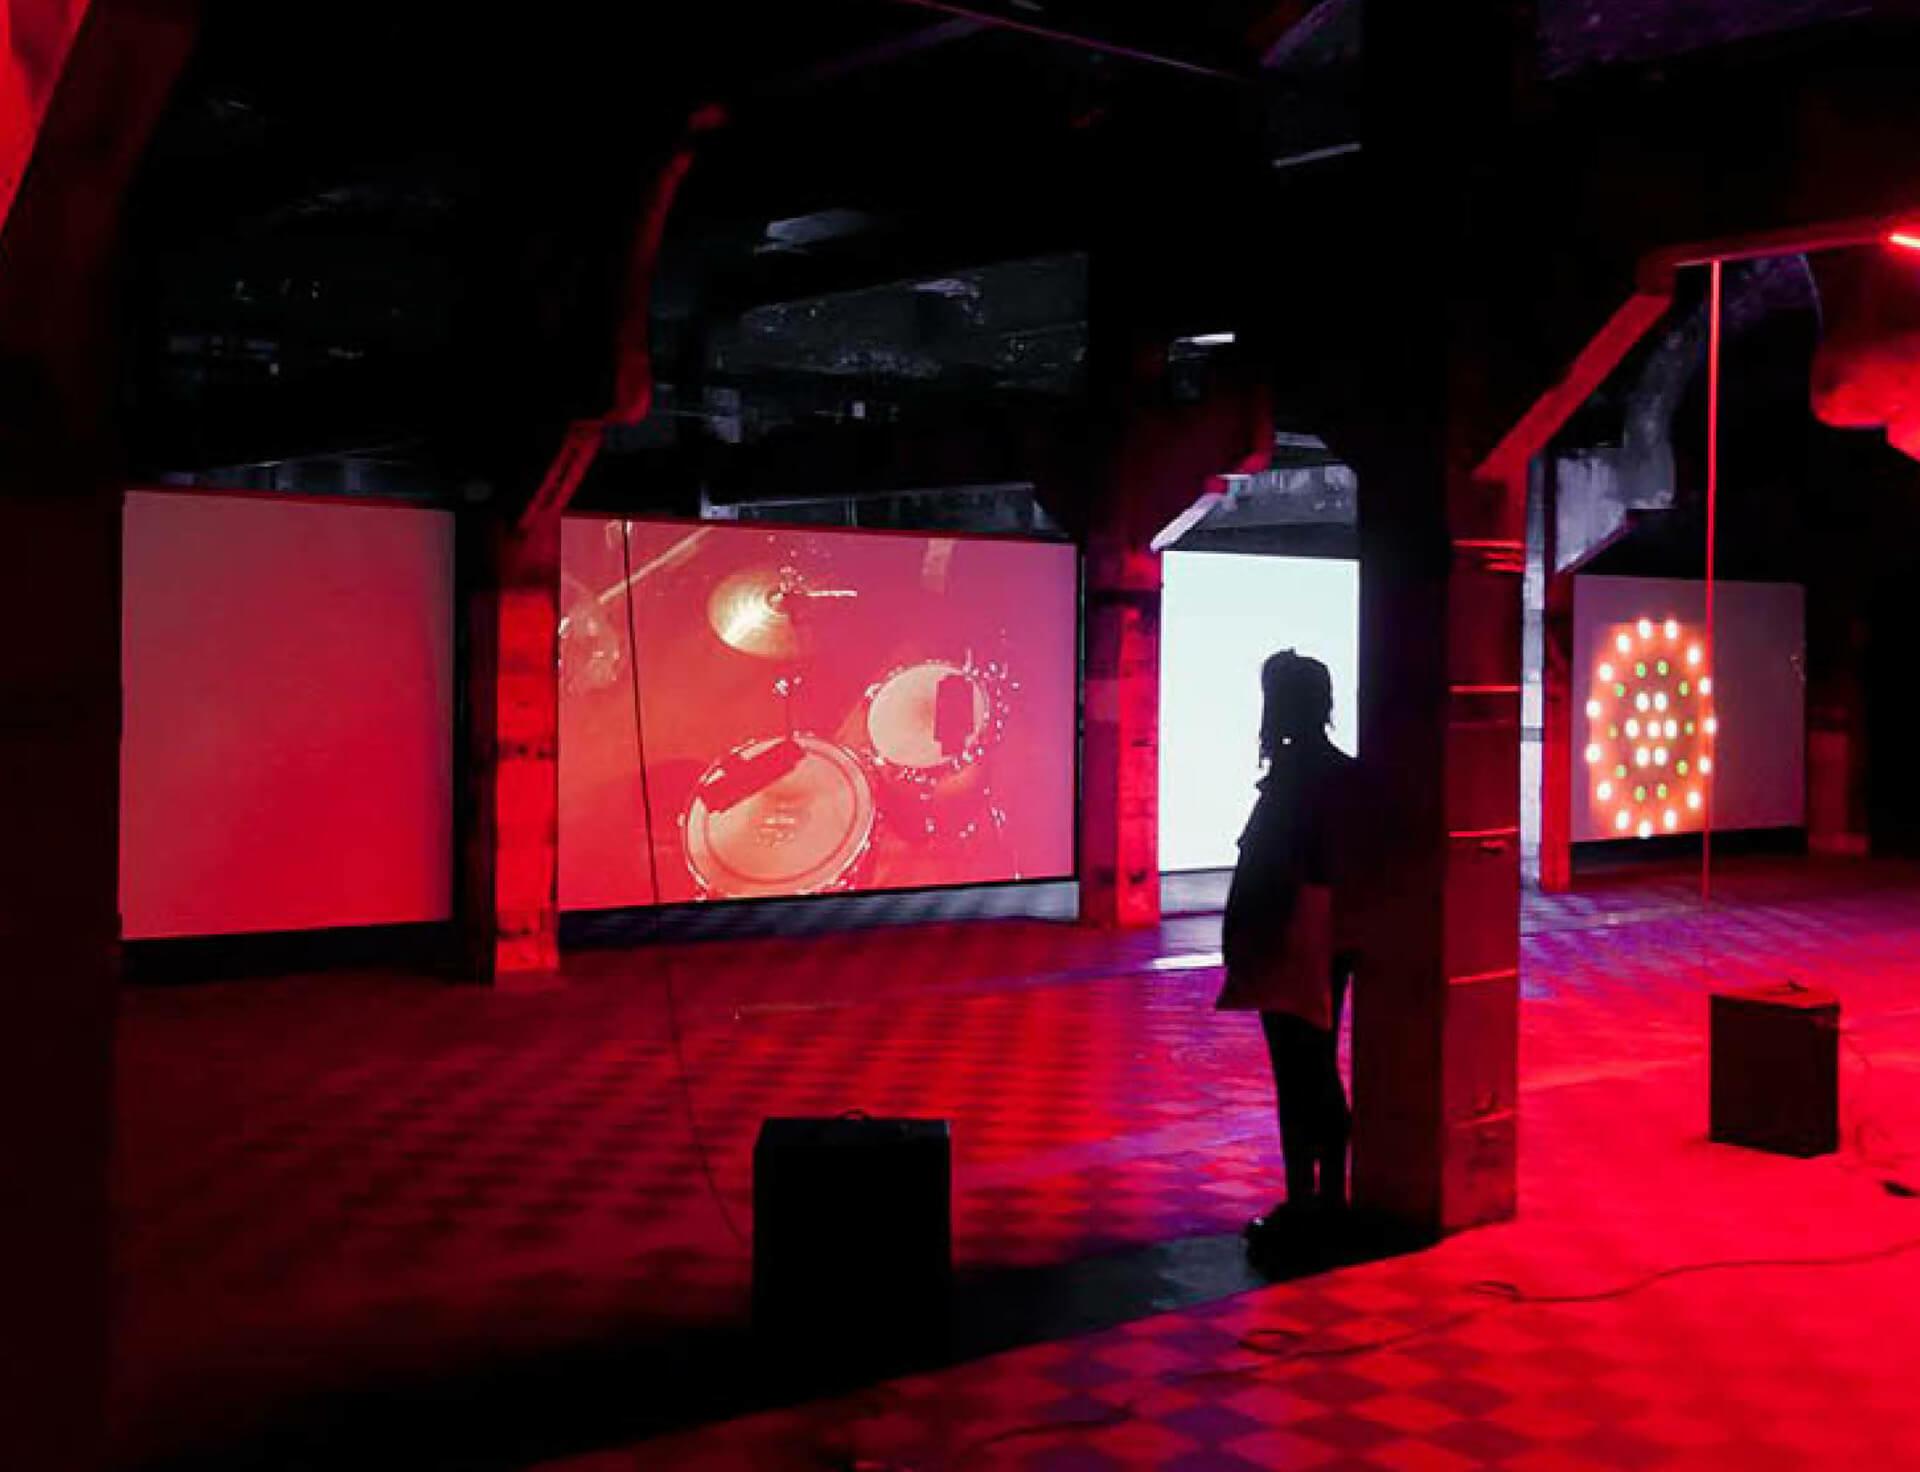 PIVÔ presents Haroon Mirza's first exhibition in São Paulo, Brazil